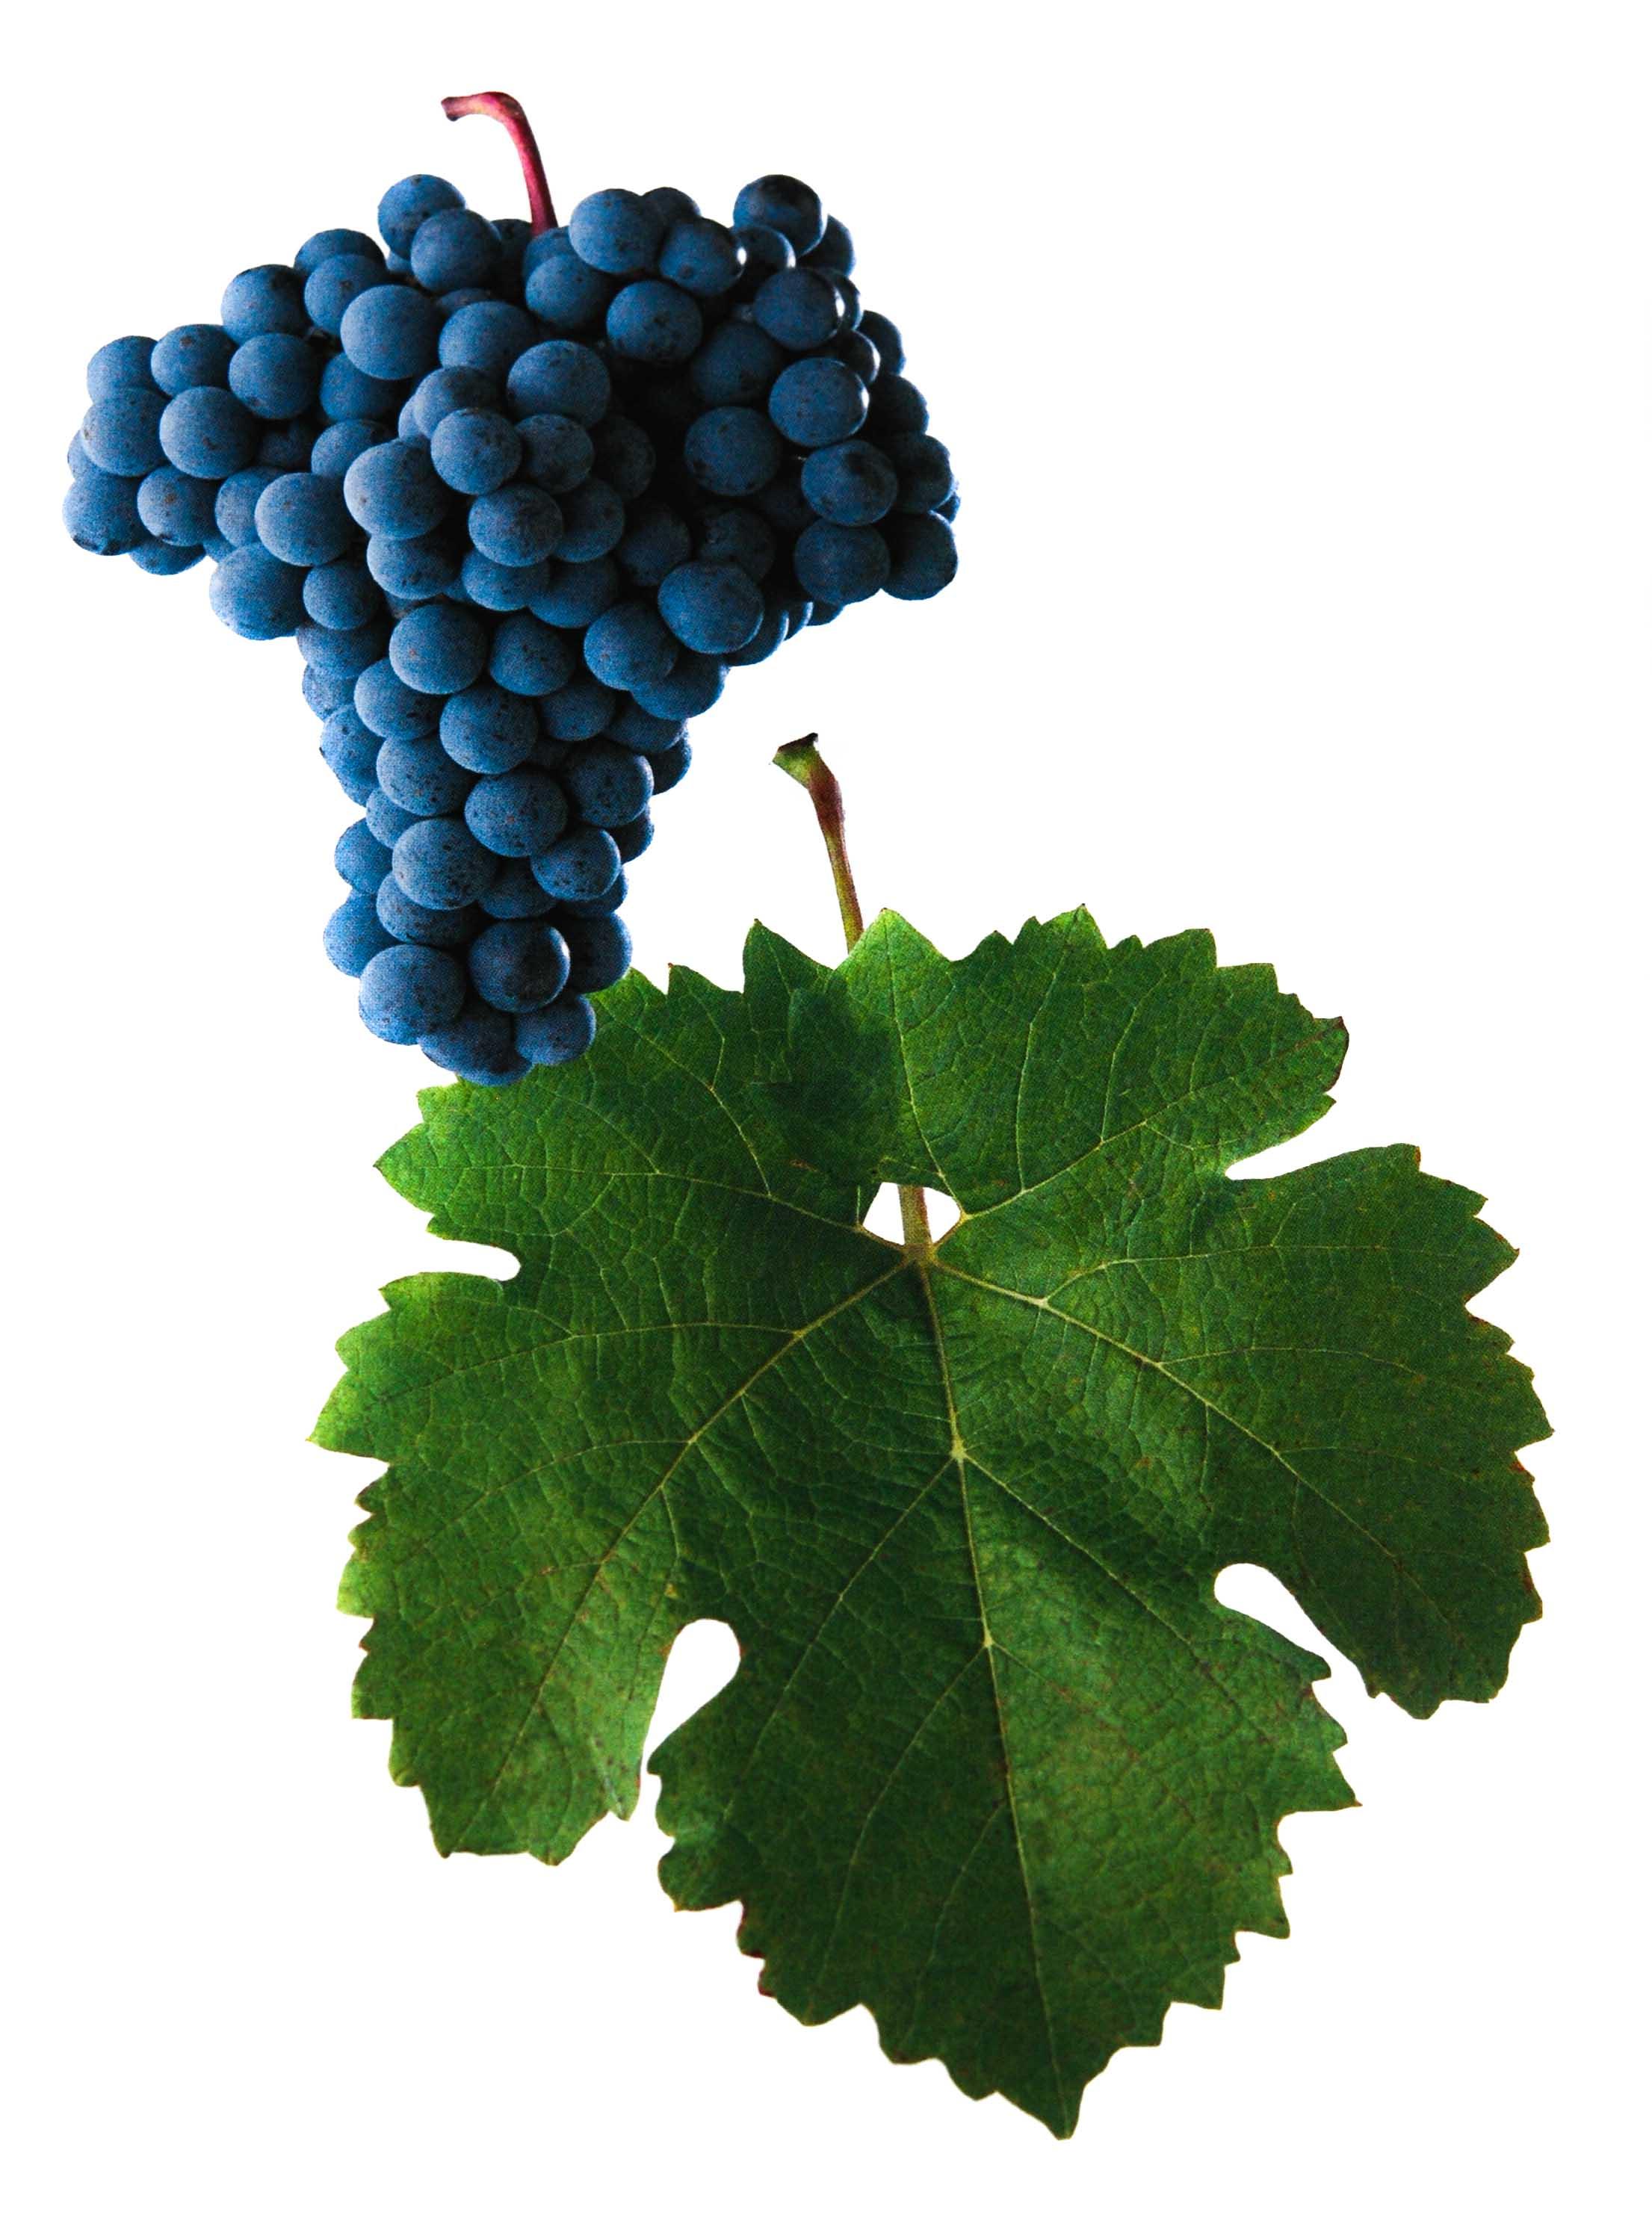 Cabernet Moravia rosé víno hrozen a list